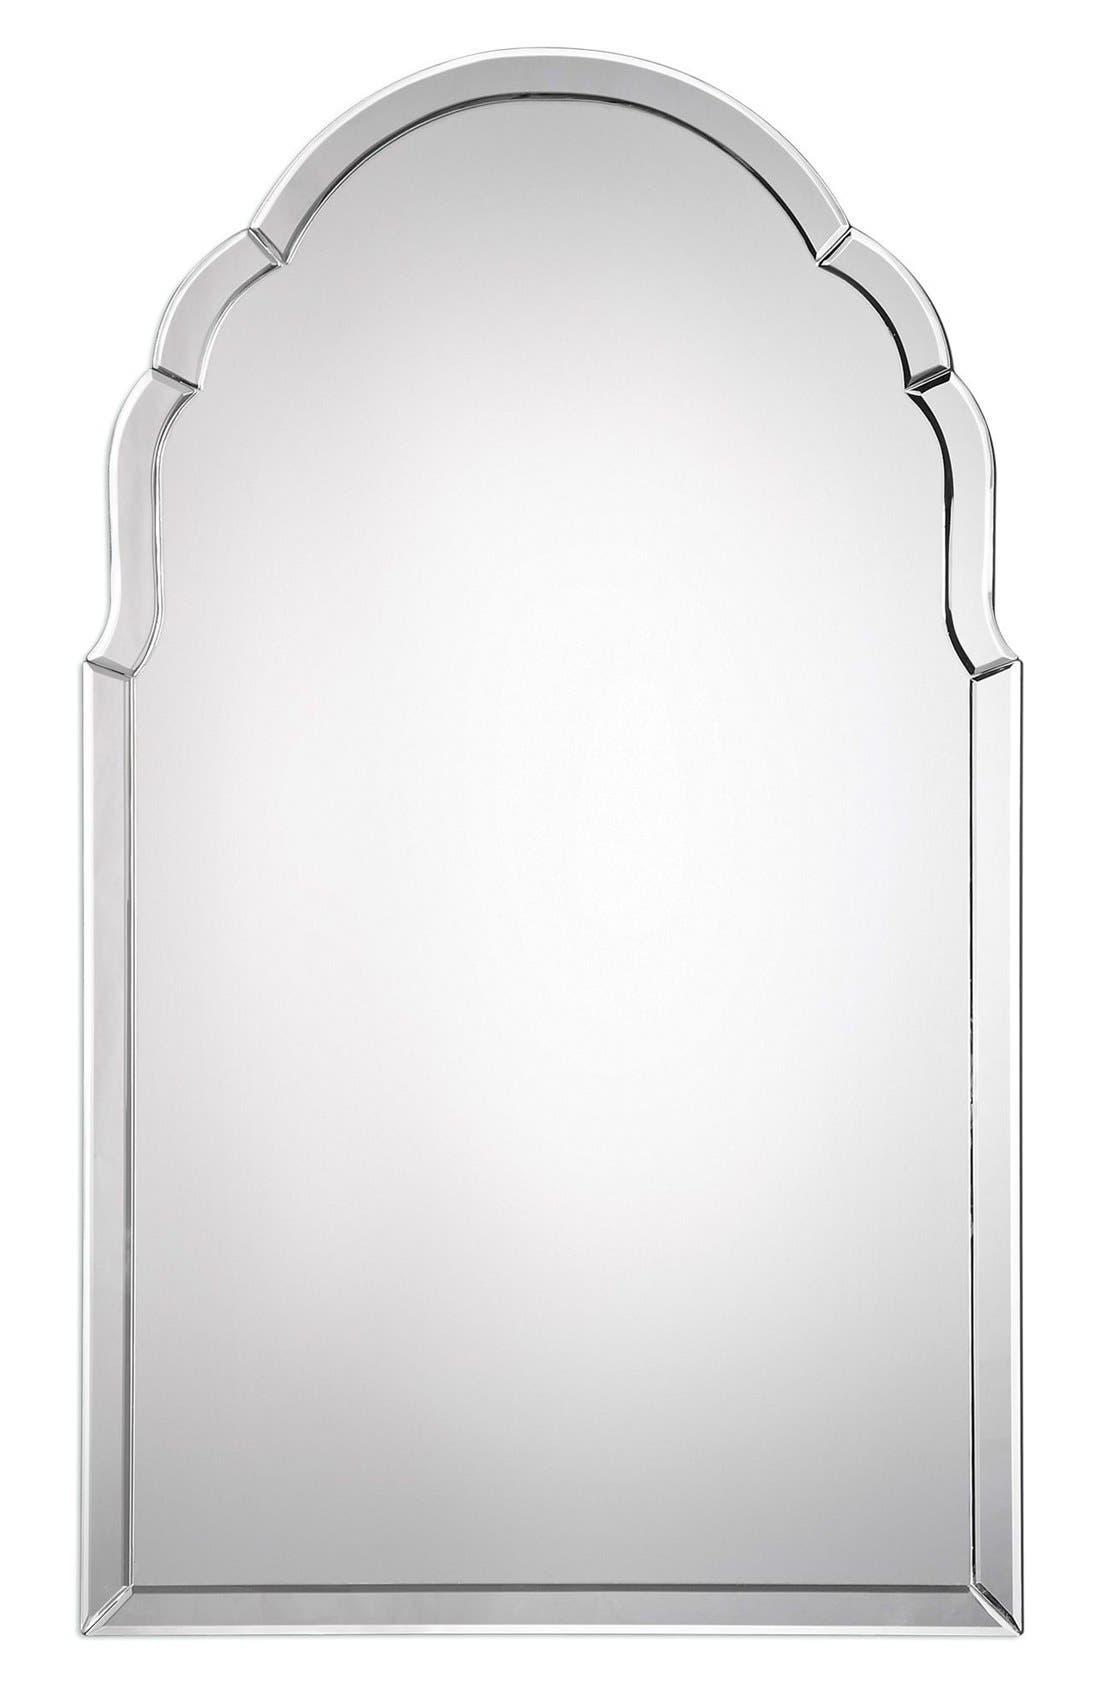 Main Image - Uttermost Frameless Arch Mirror